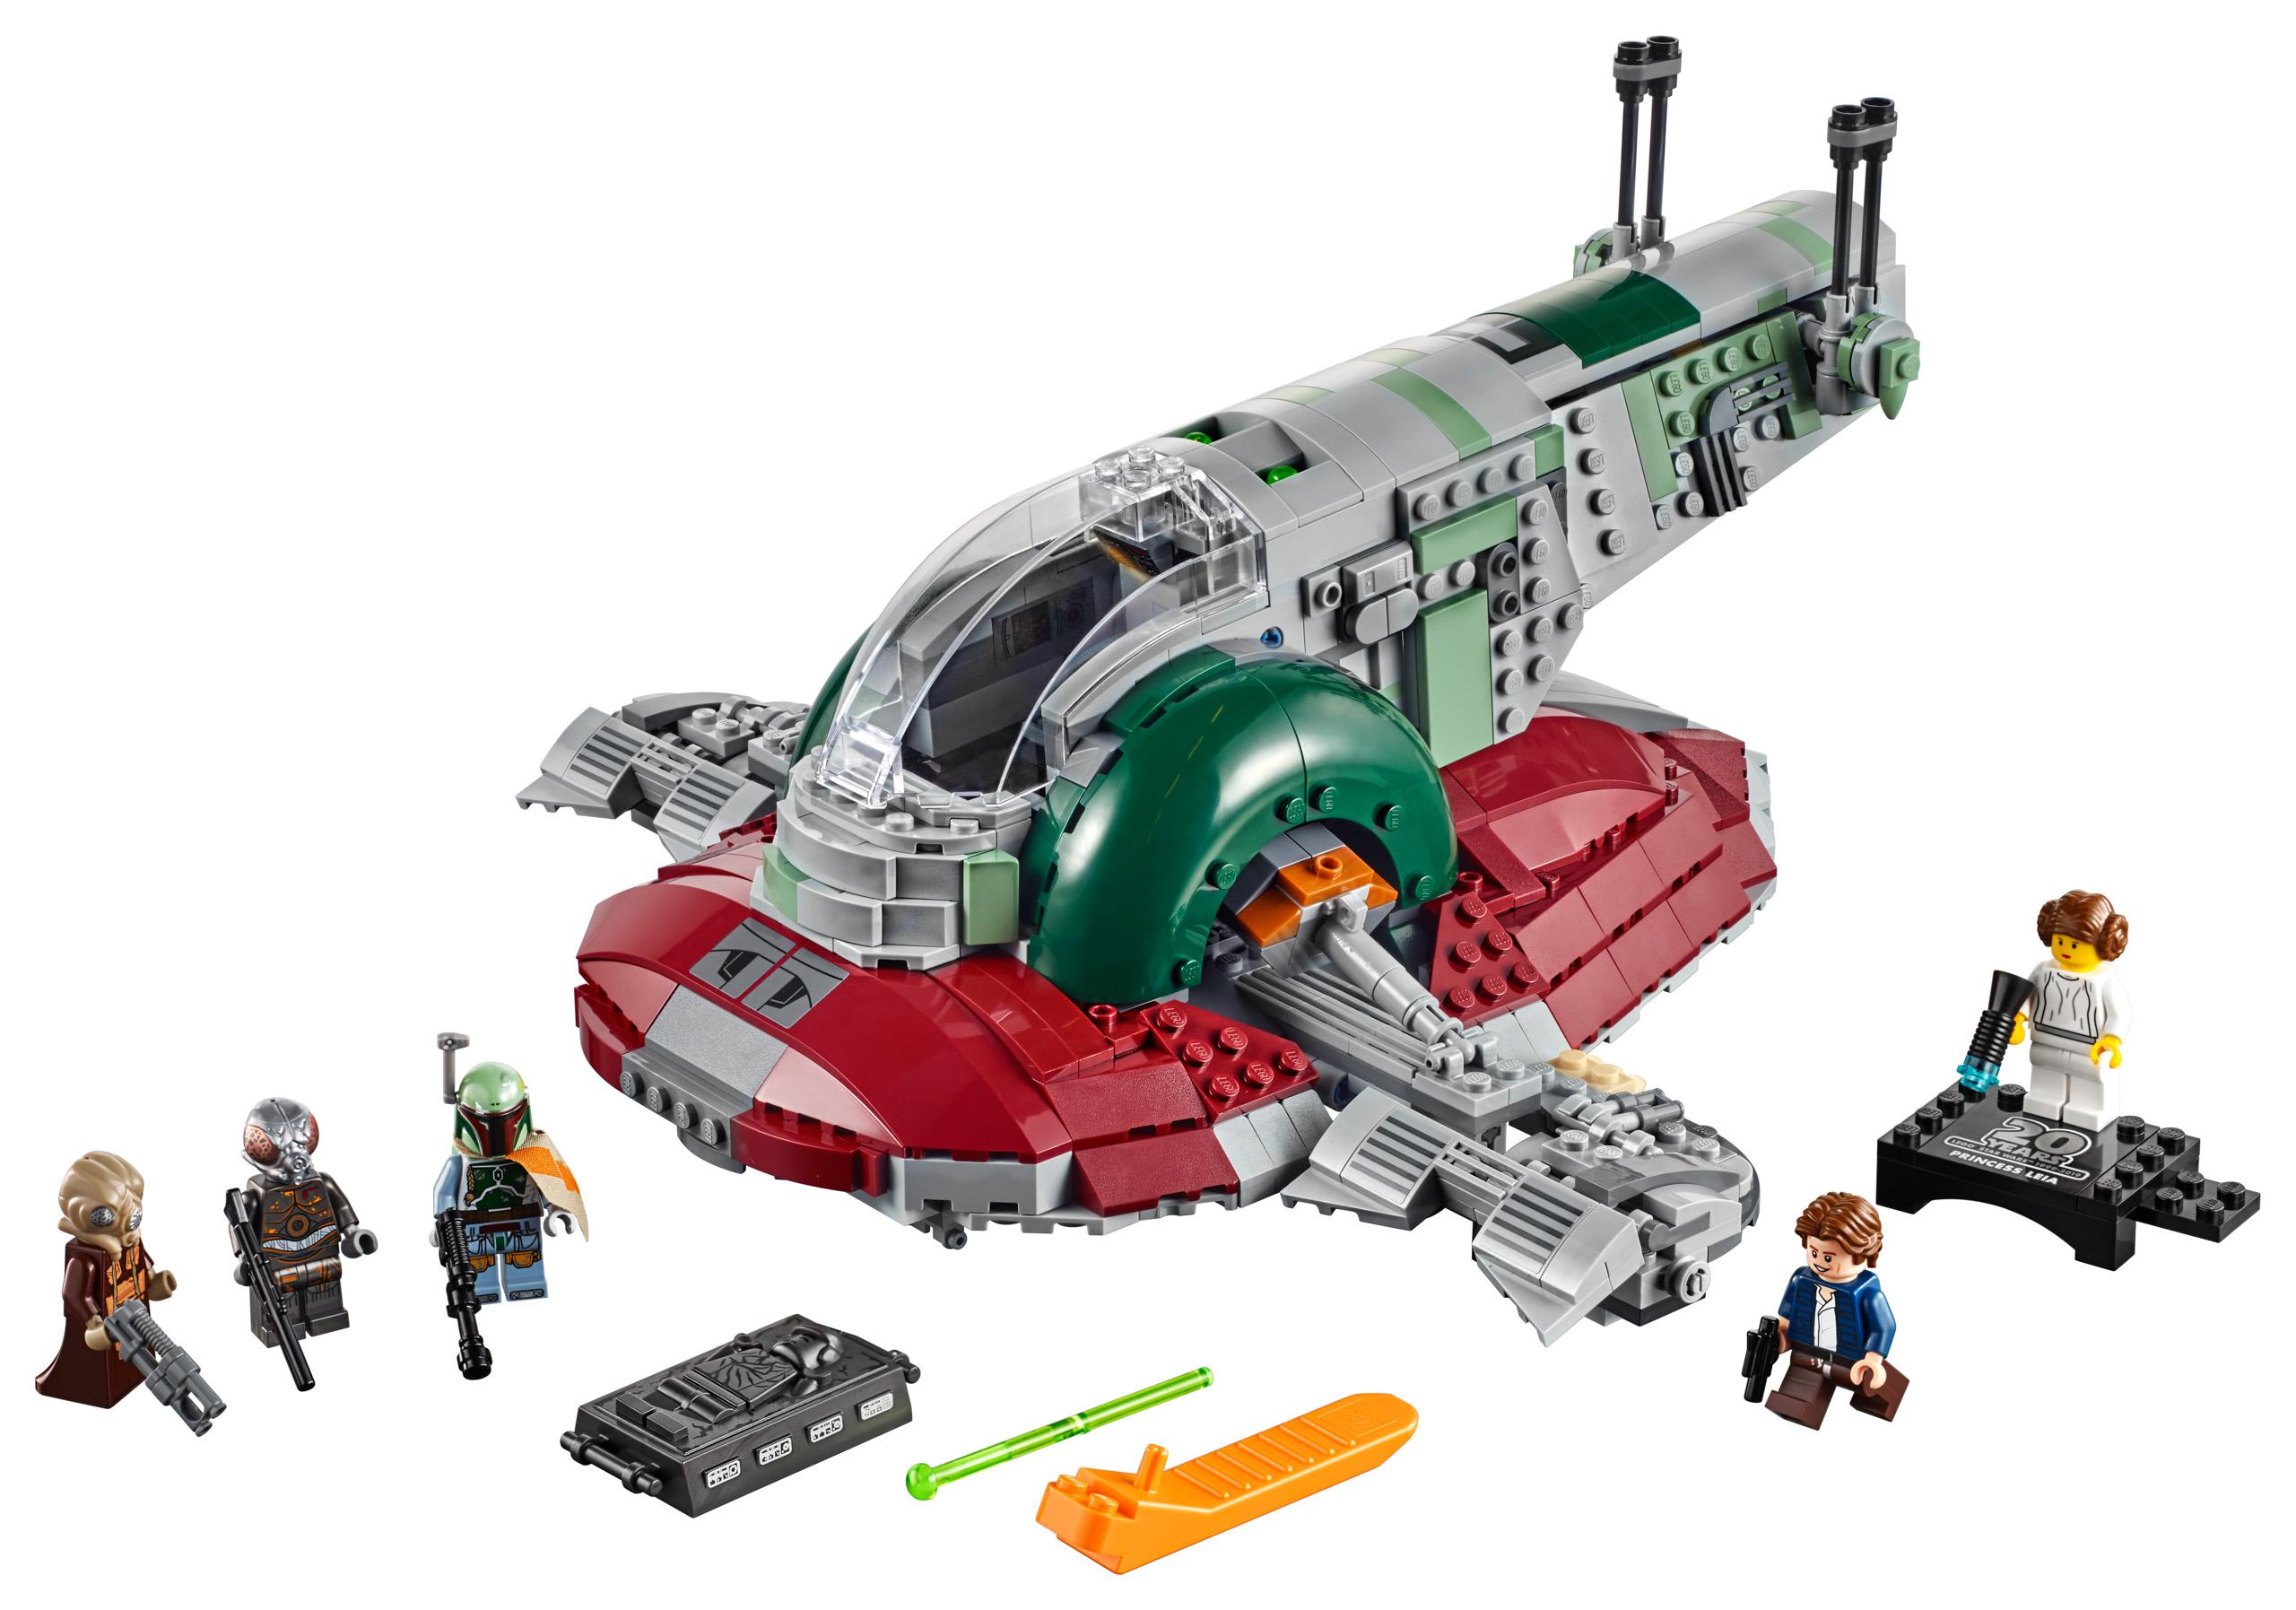 lego-star-wars-75243-slave-i-20th-anniversary-edition.jpg